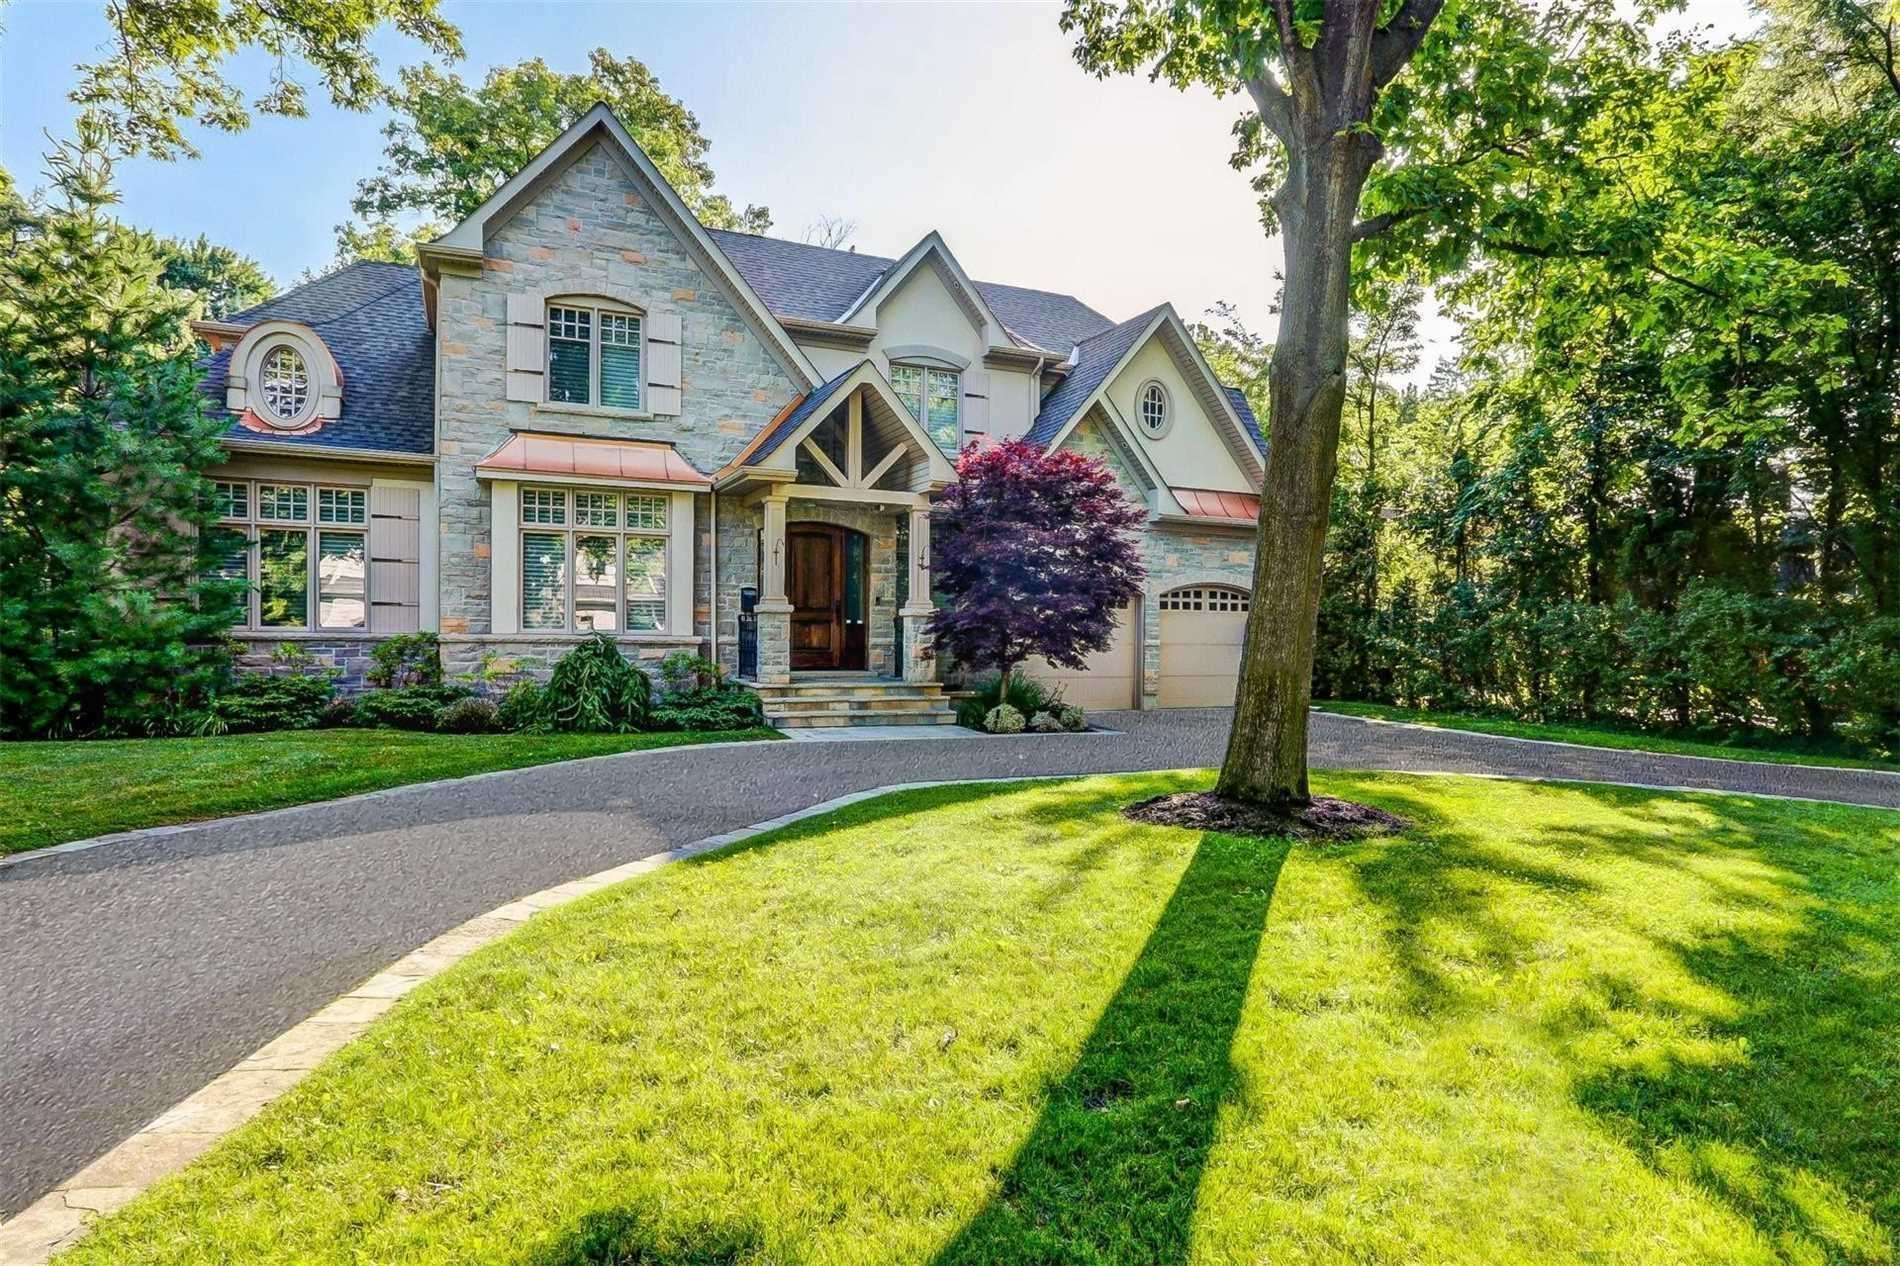 1577 Glenburnie Rd, Mississauga W4478087